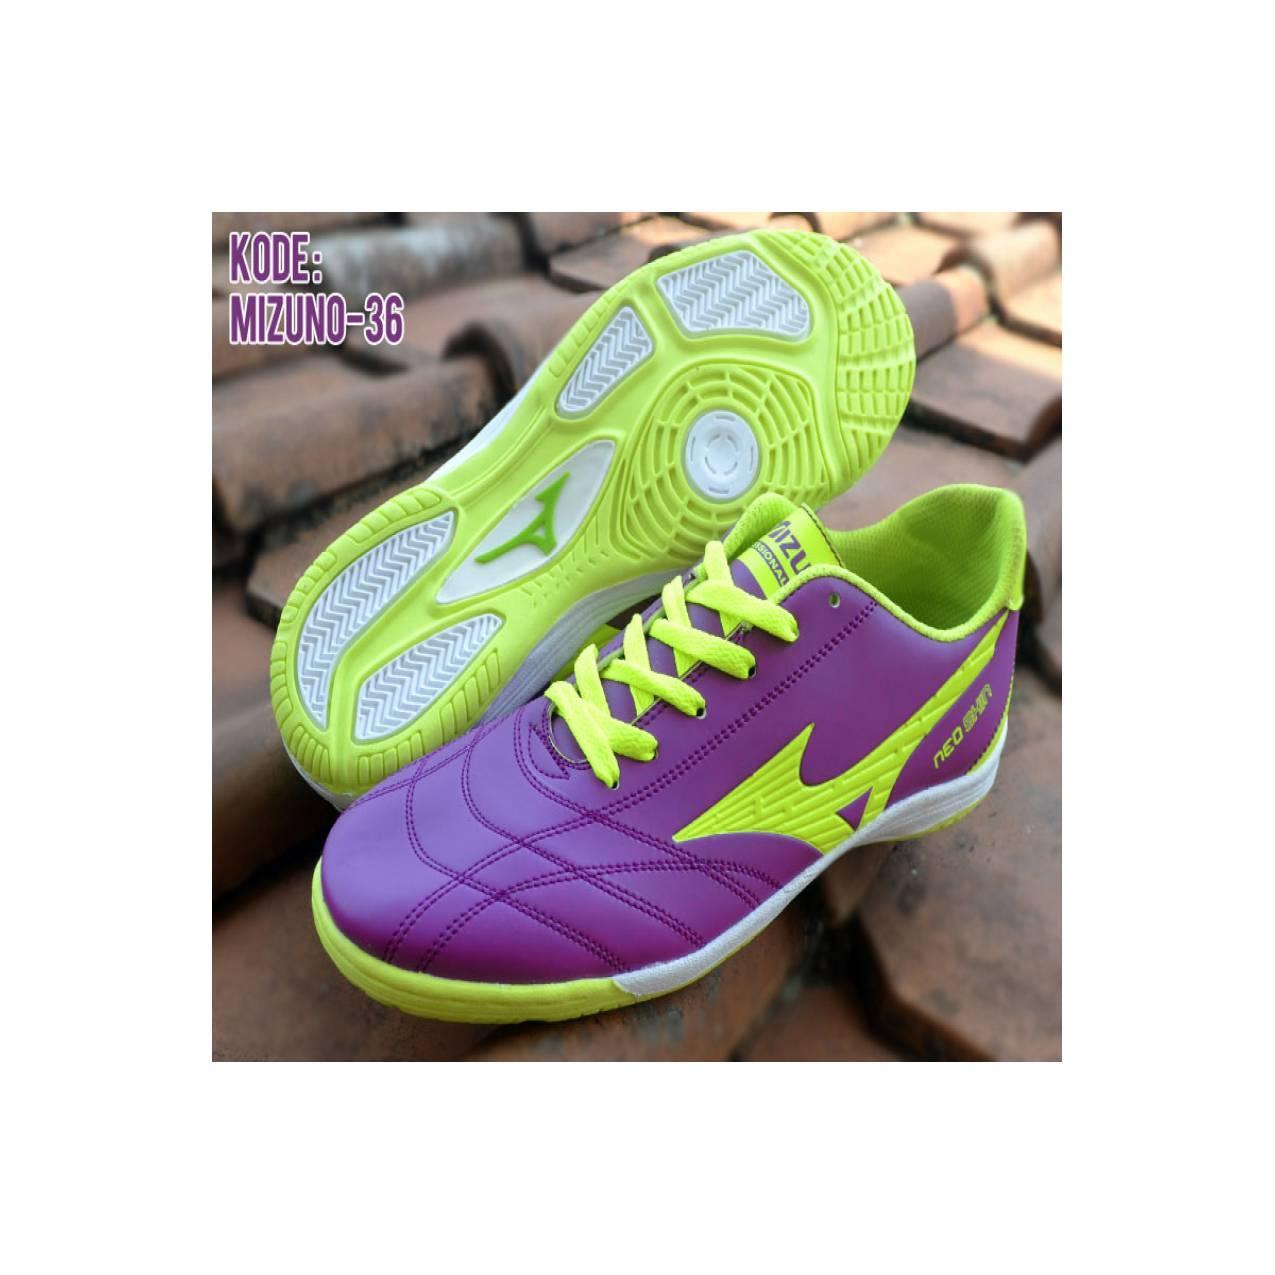 Sepatu Futsal Mizuno KW 1 Kode Mizuno 36